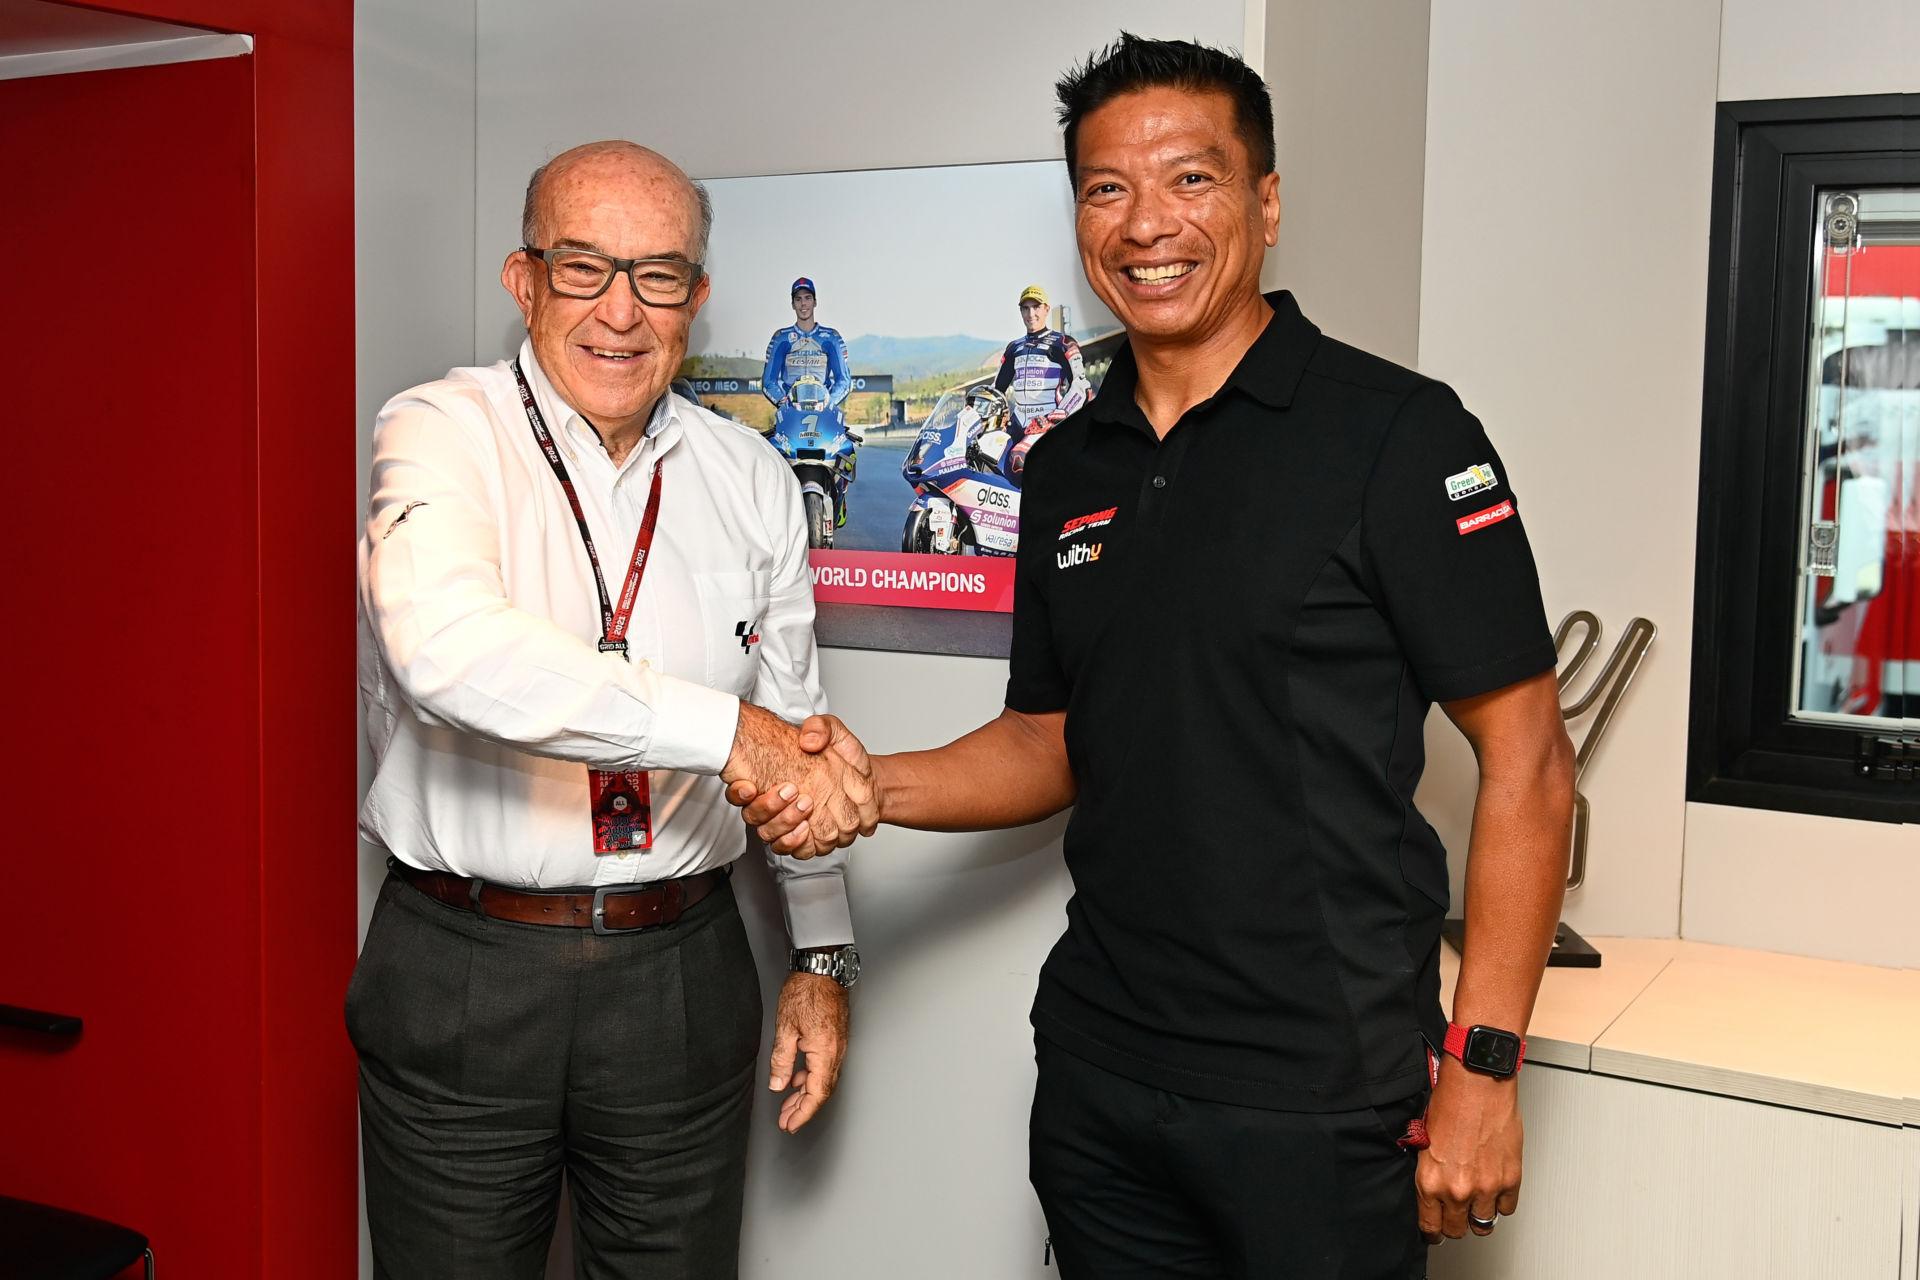 Dorna CEO Carmelo Ezpeleta (left) and Razlan Razali, RNF Racing Team Principal (right). Photo courtesy Dorna.